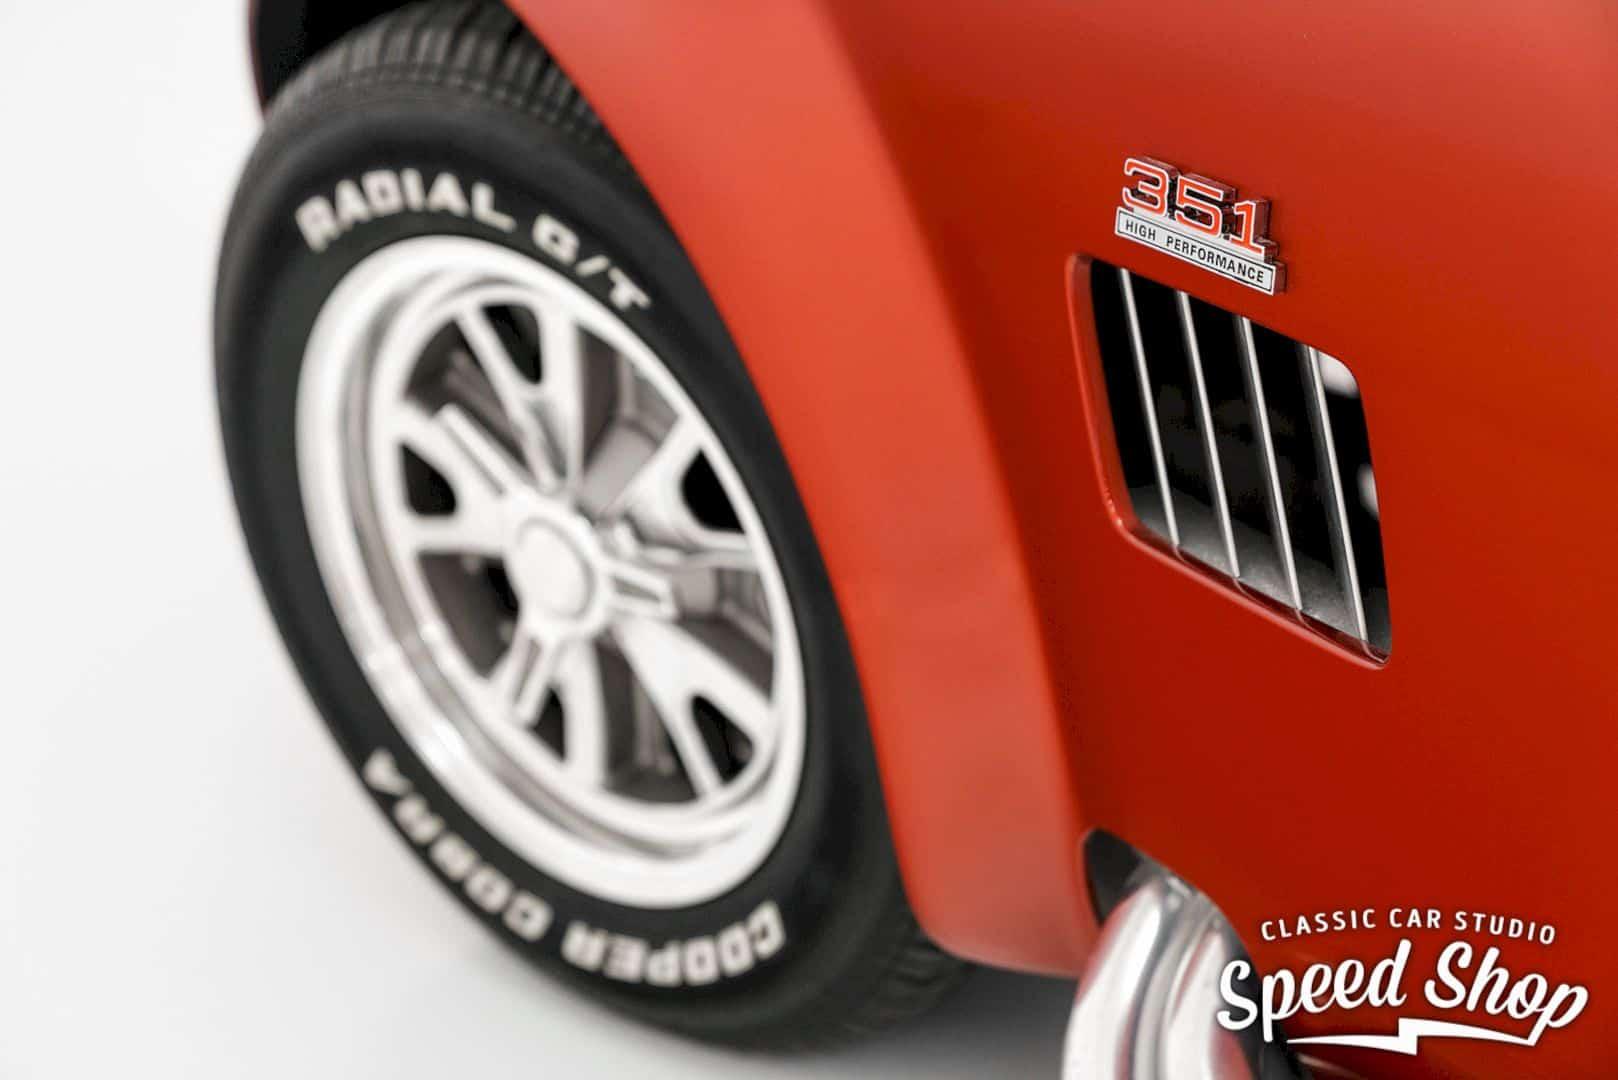 1965 Factory 5 Cobra By Classic Car Studio Shop 2